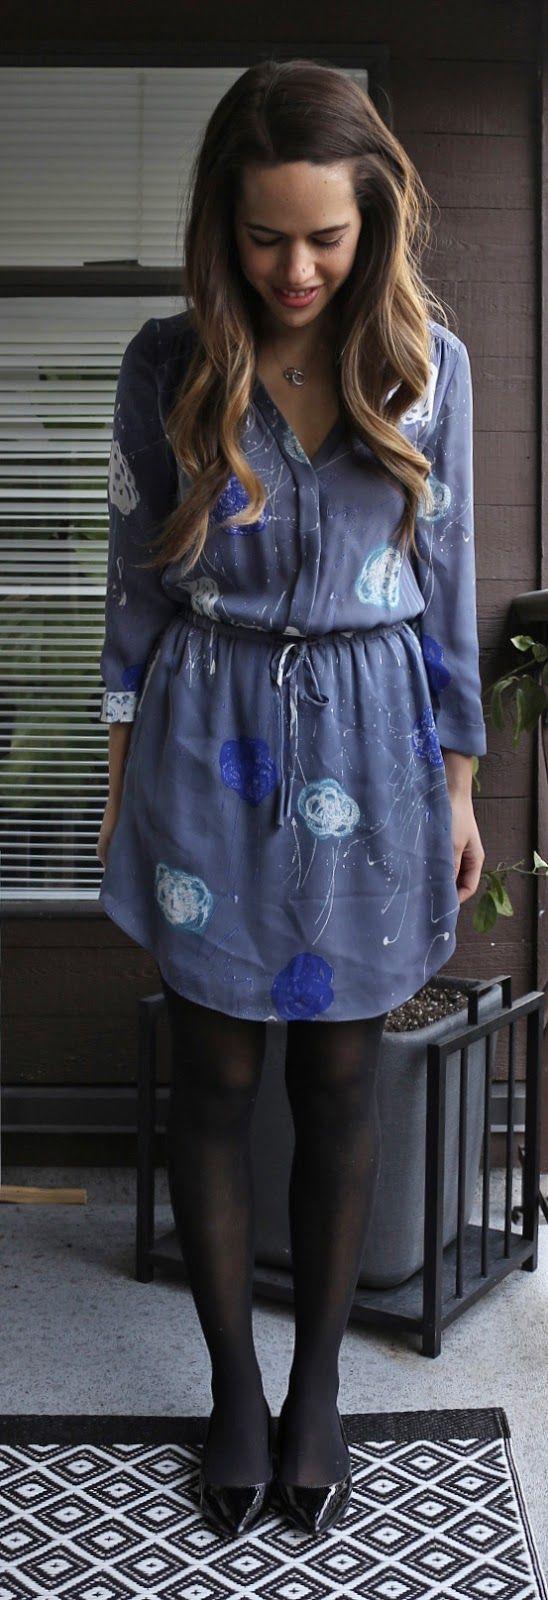 Jules in Flats - Babaton silk dress, Aldo Deloris block heel patent pumps